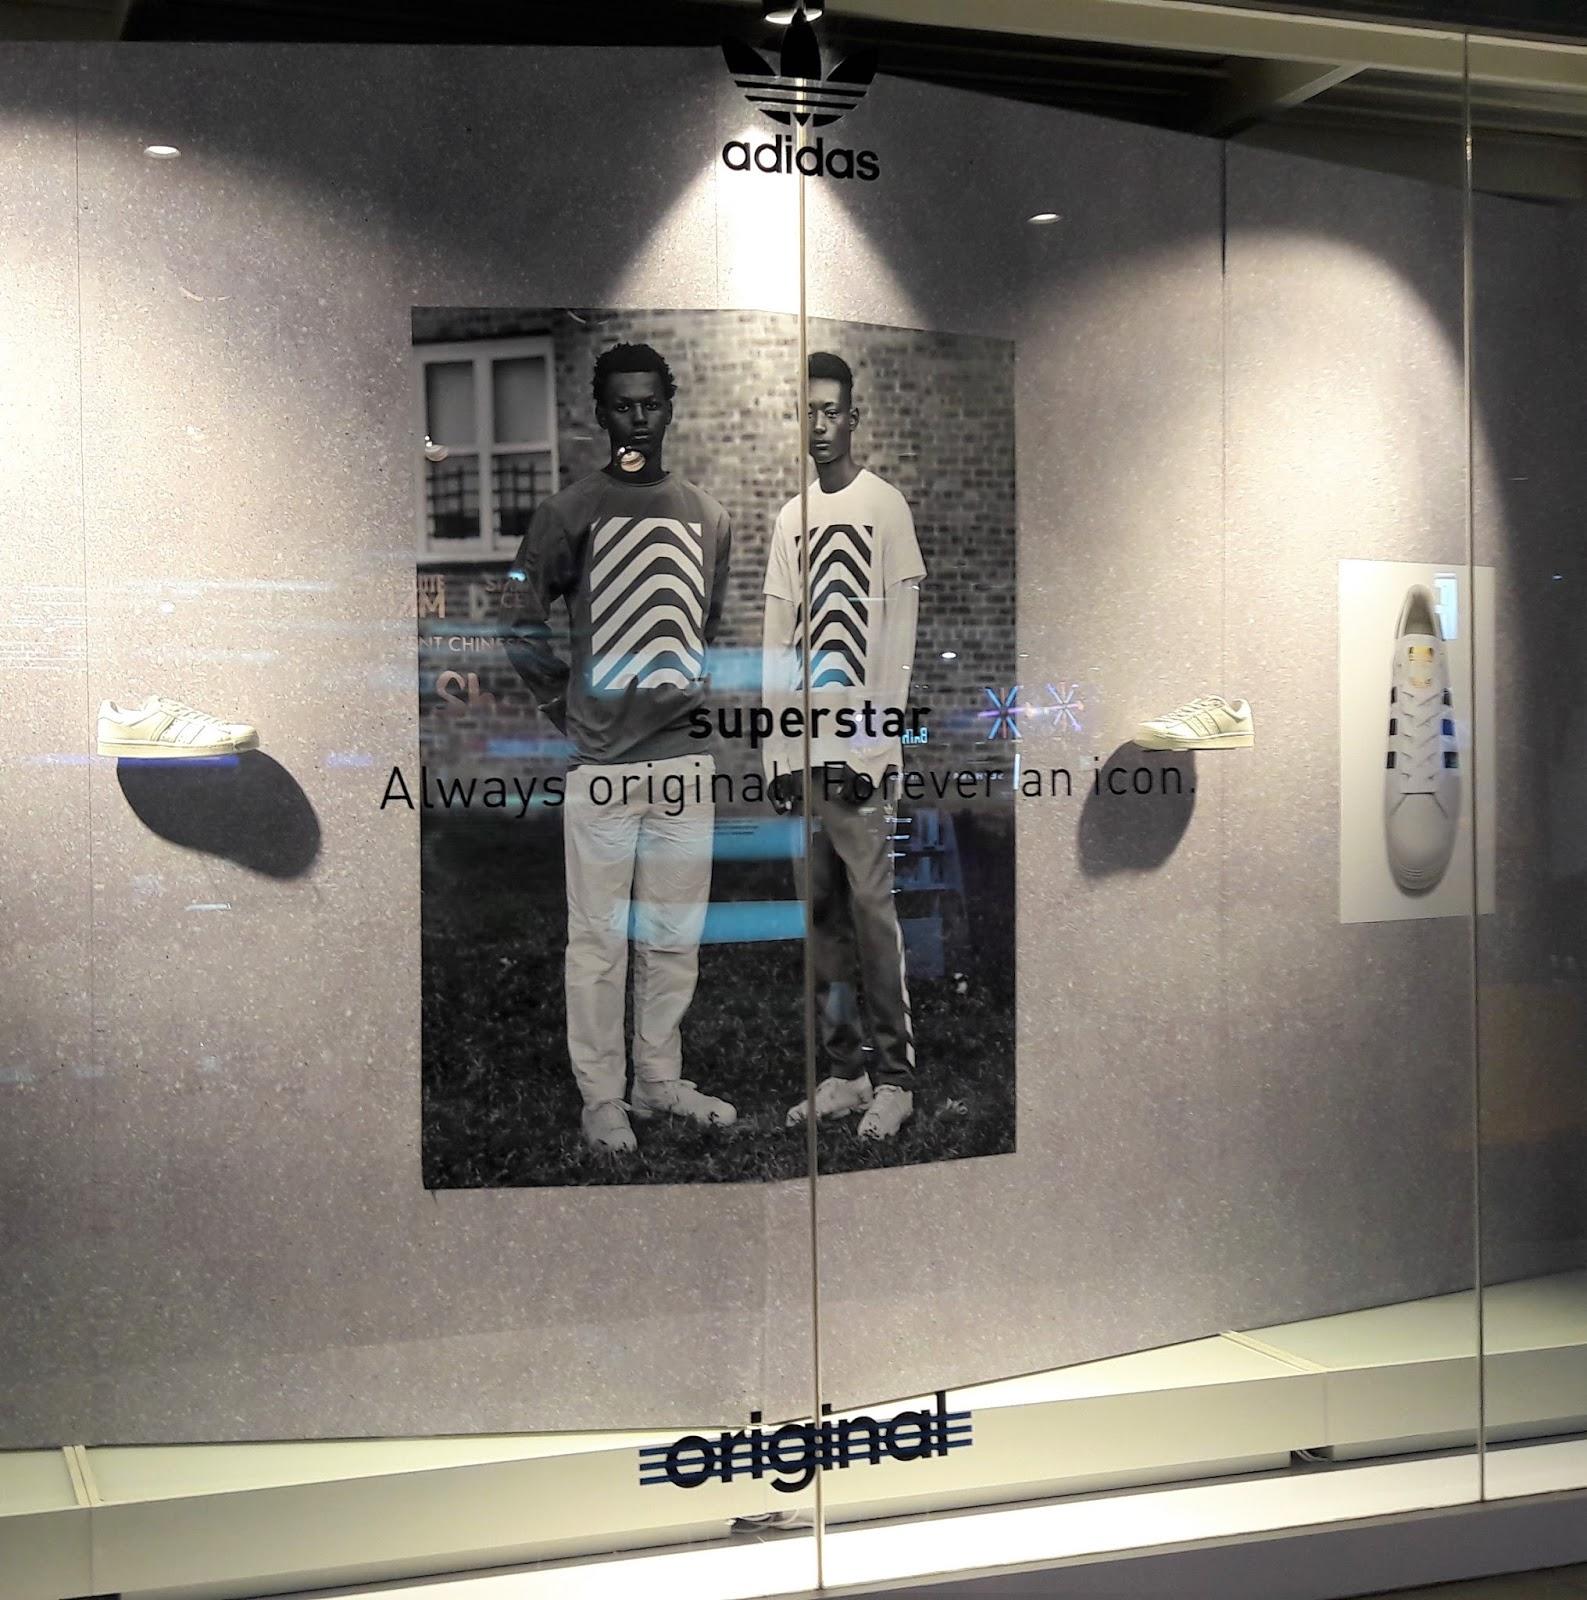 0929f2ee232a1 adidas windows at Siam Center Bangkok